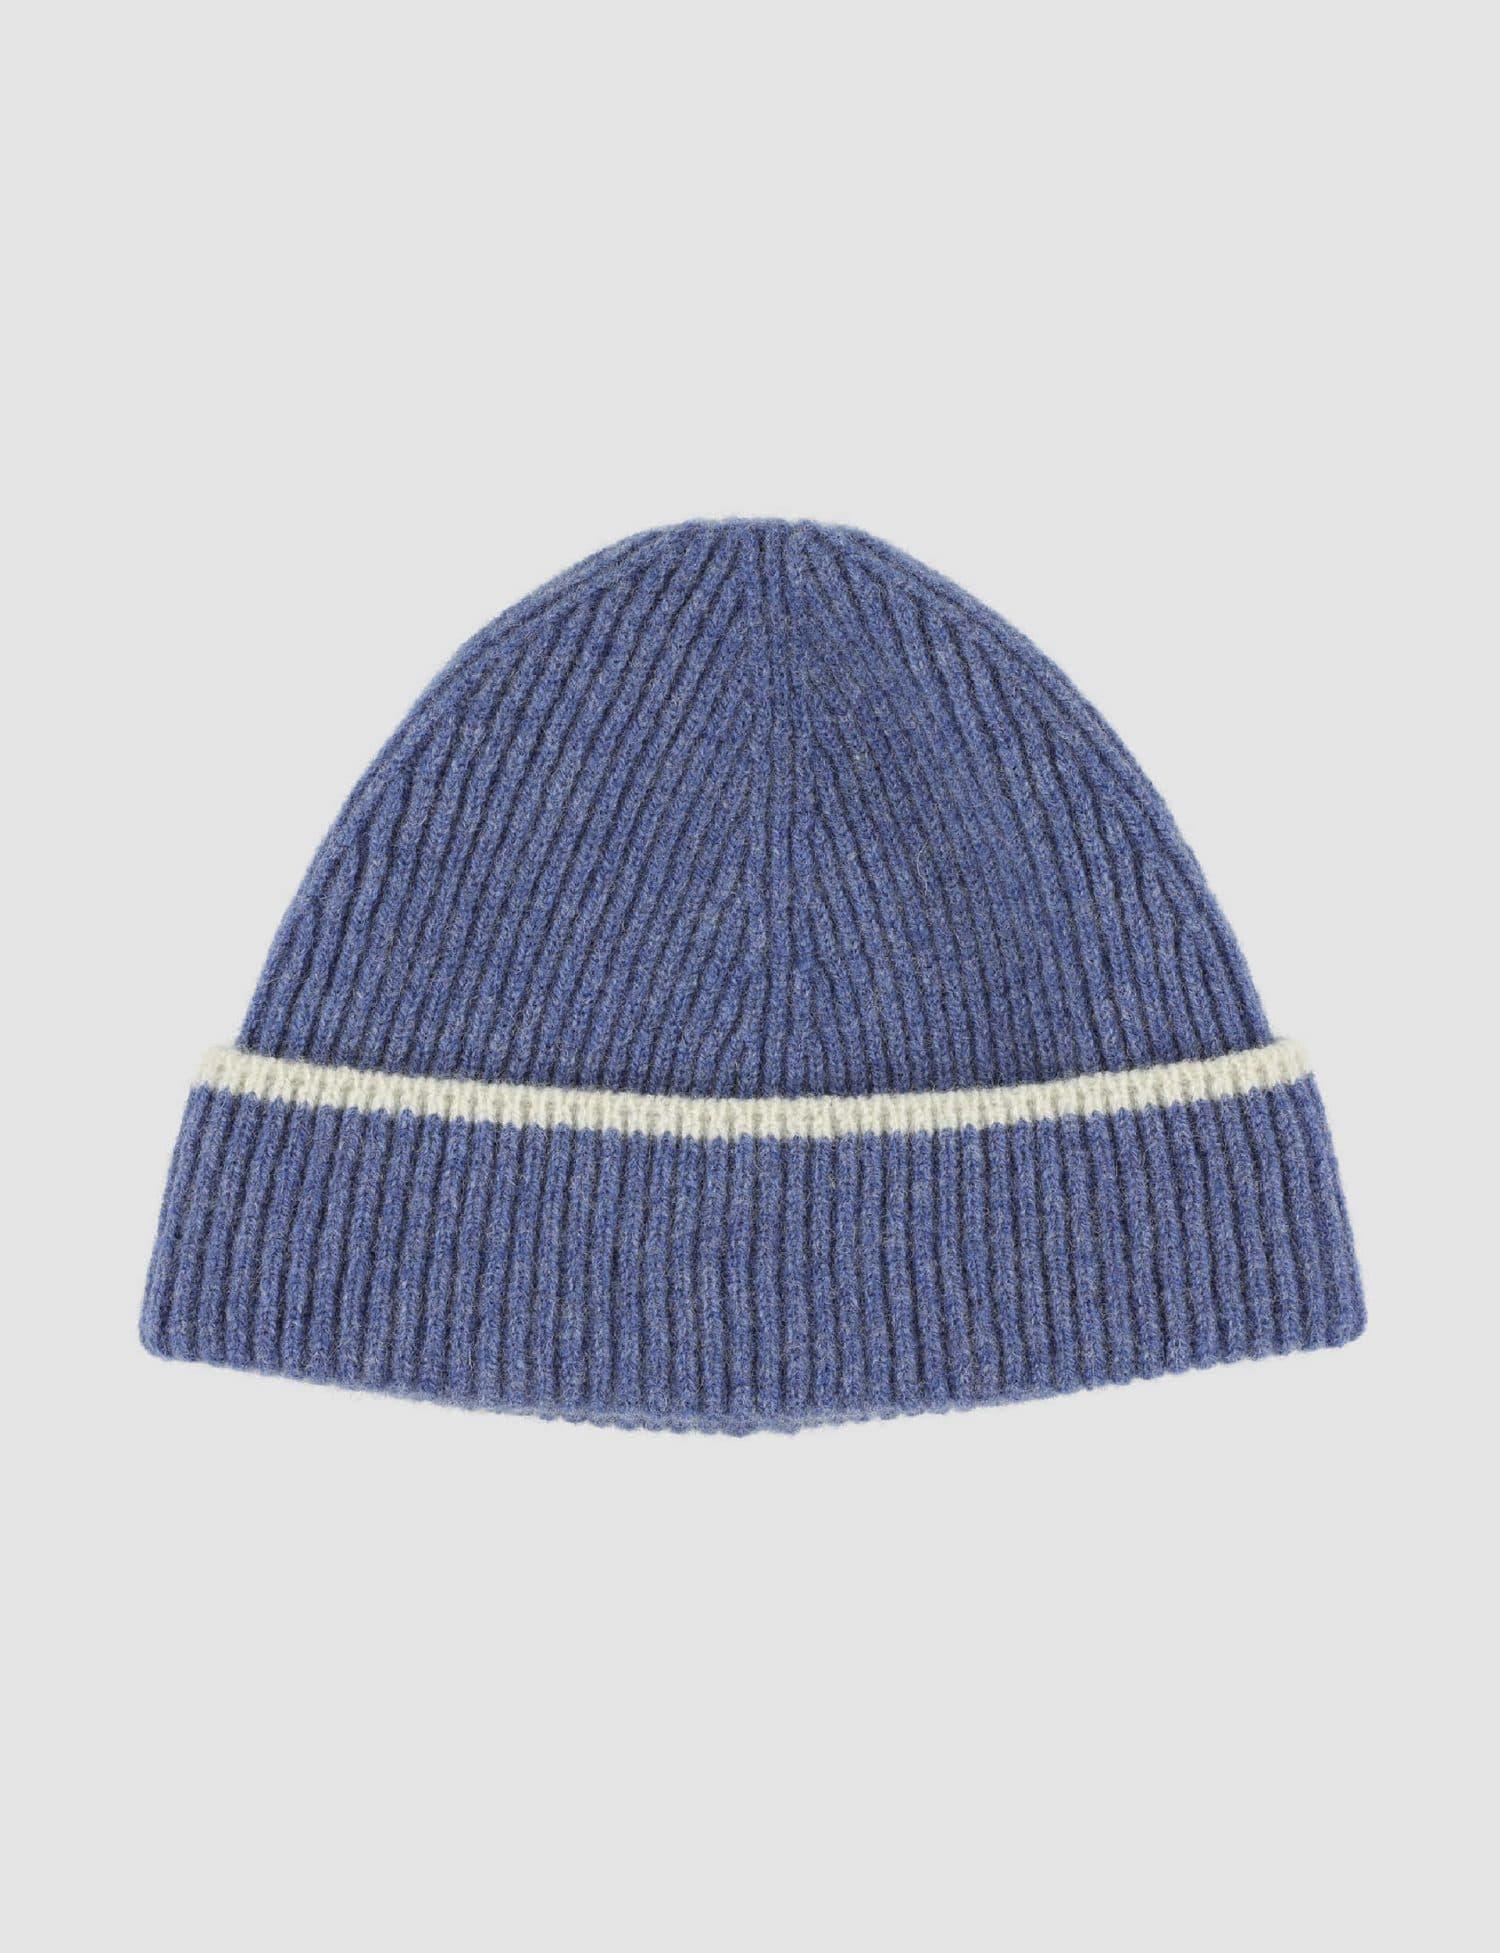 Barnet - Royal Blue